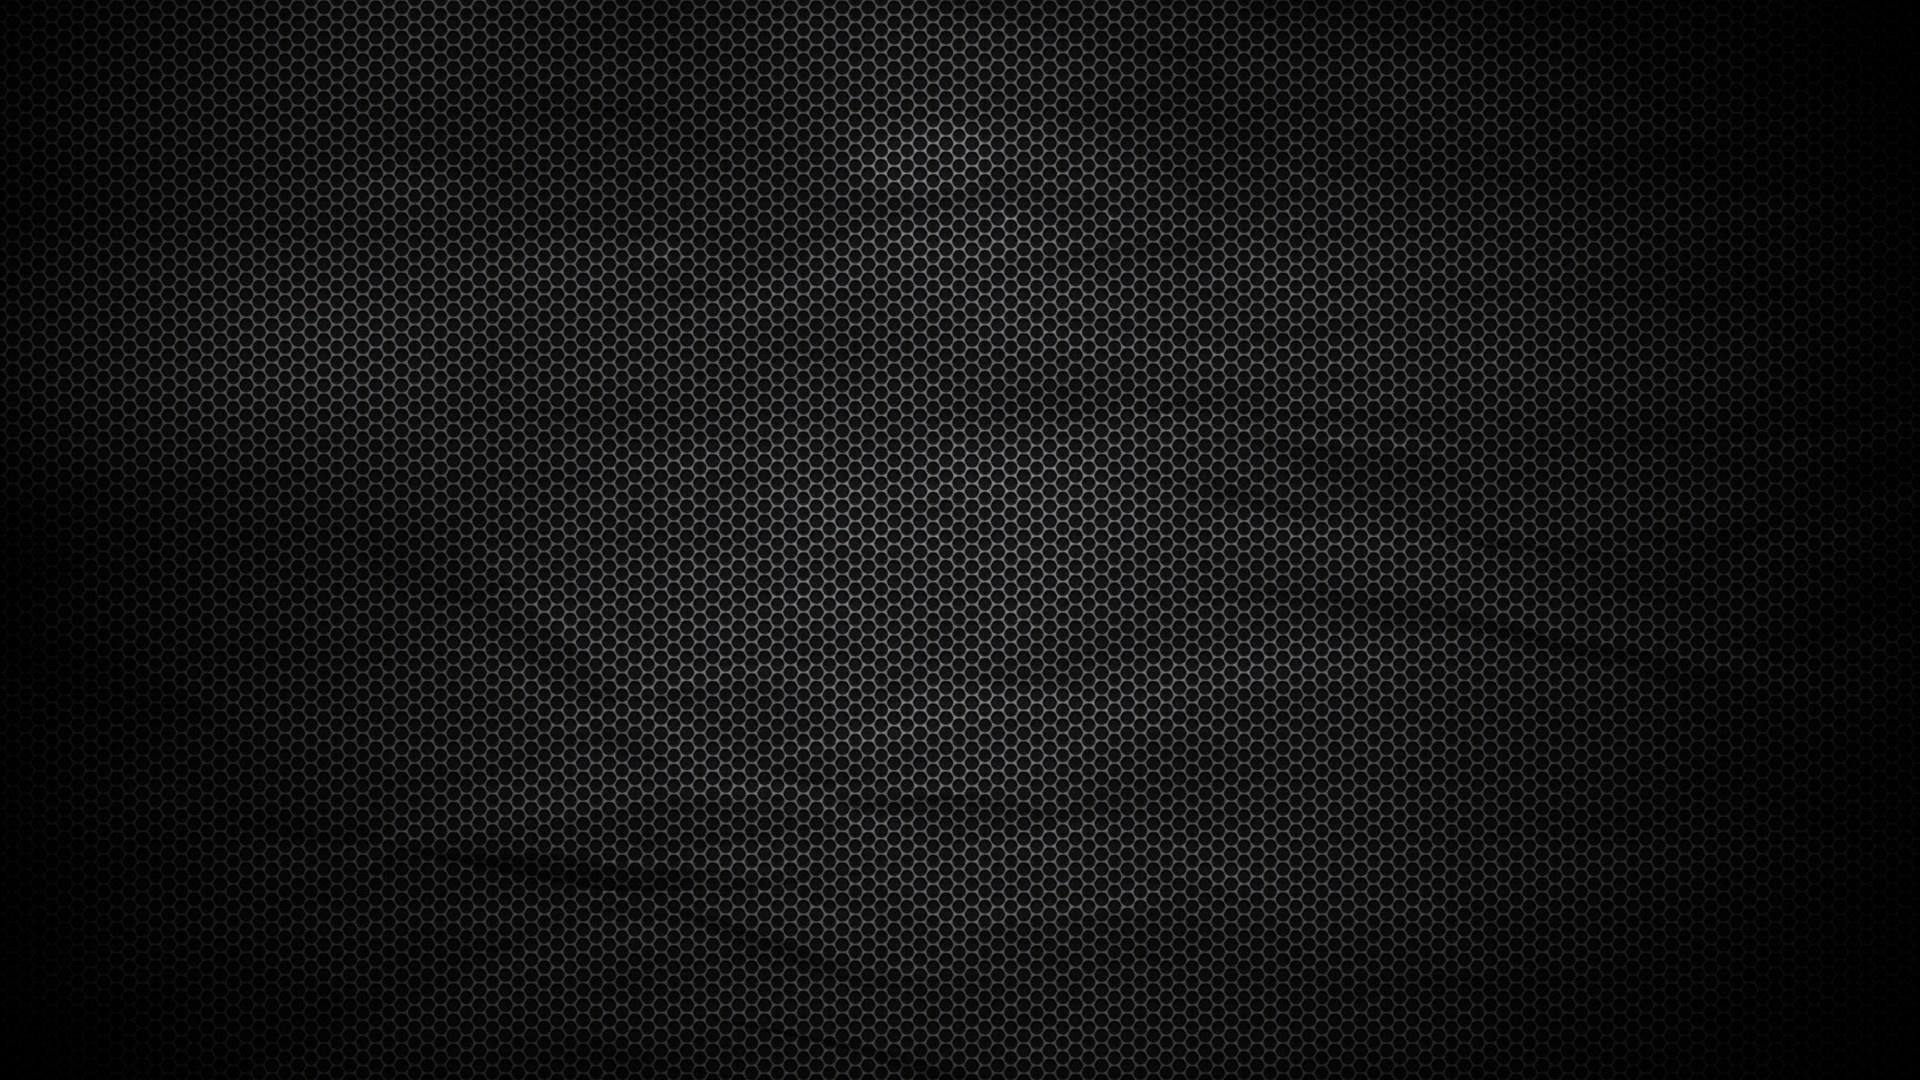 Black Wallpapers Best Wallpapers 1920x1080